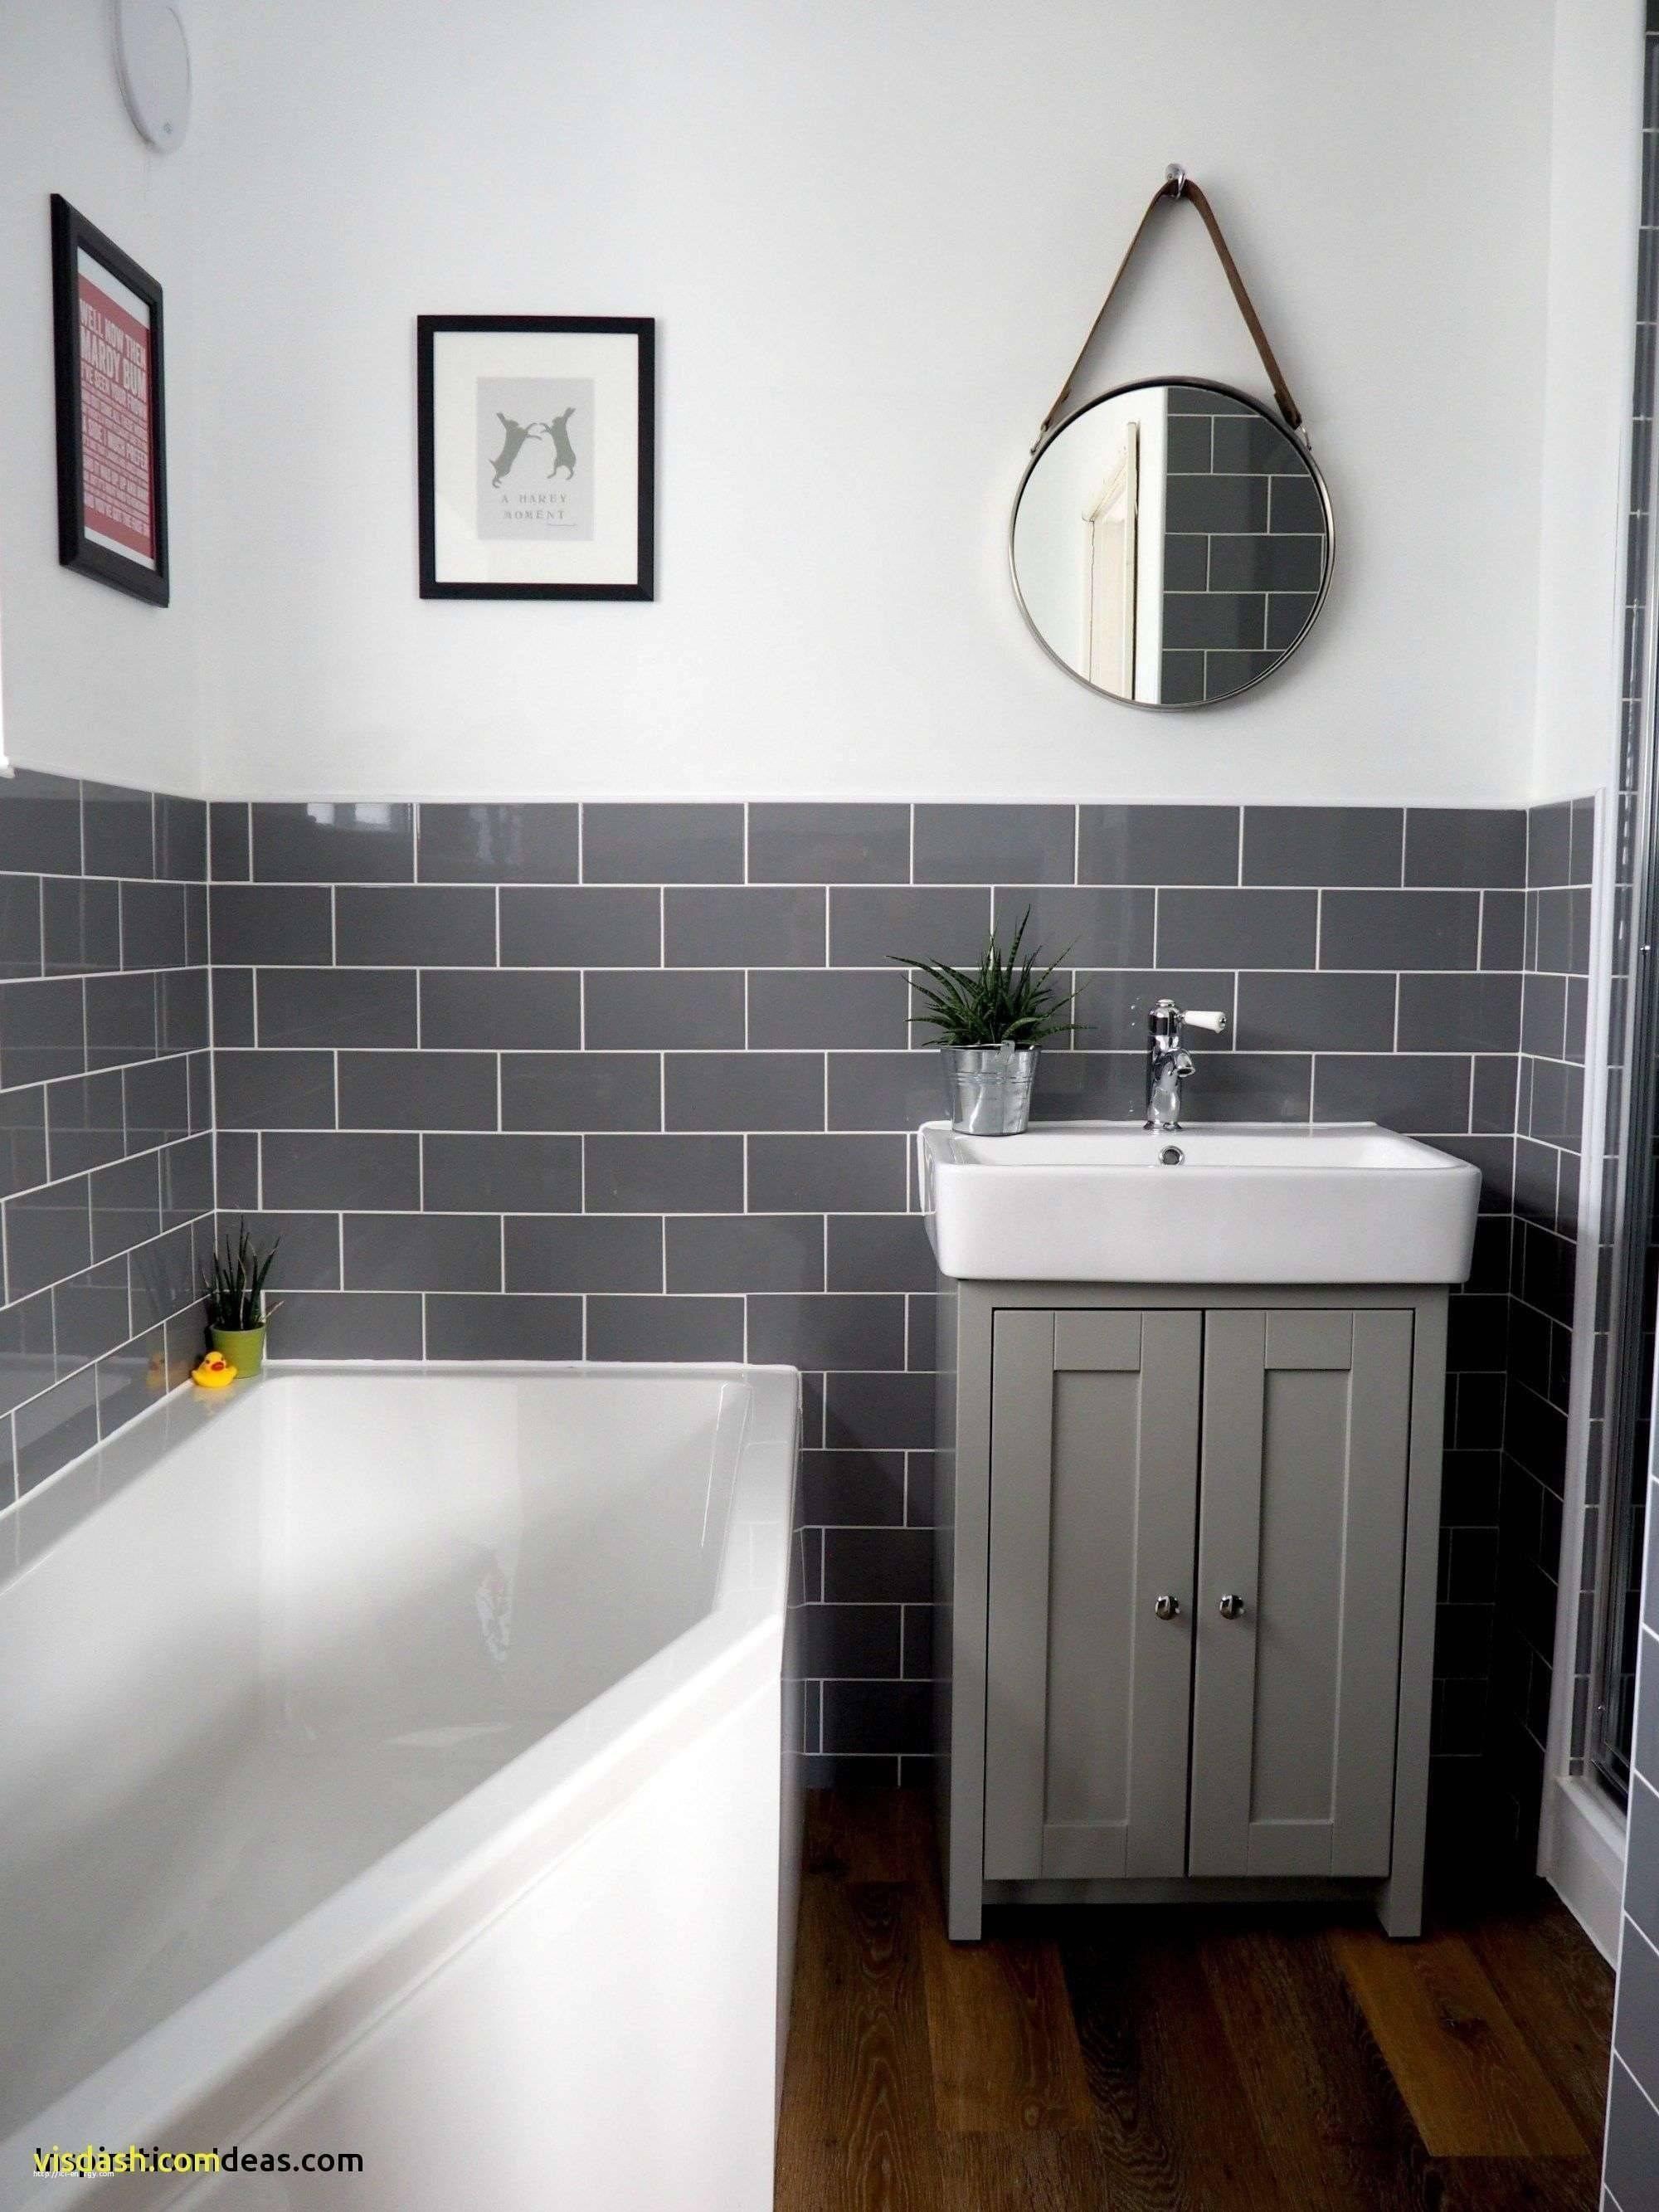 bathroom design inspiration luxury home ideas shower tile ideas astonishing best small bathroom of bathroom design inspiration